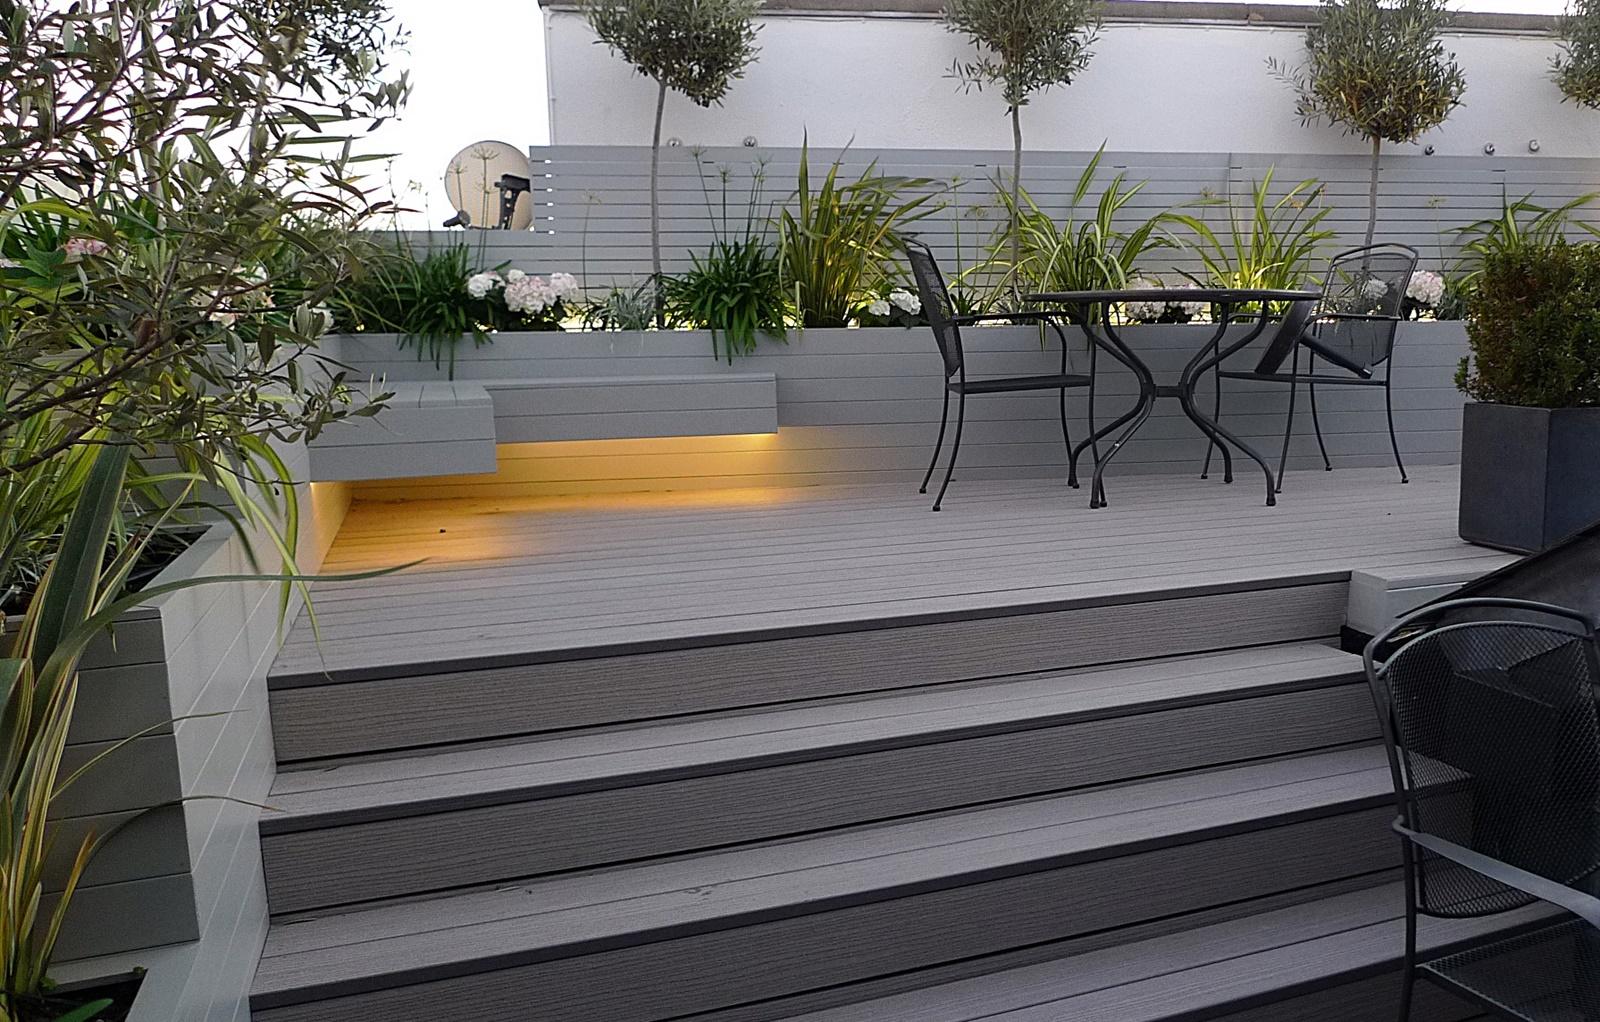 Raised beds formal clapham balham painted fence trellis for Grey decking garden ideas